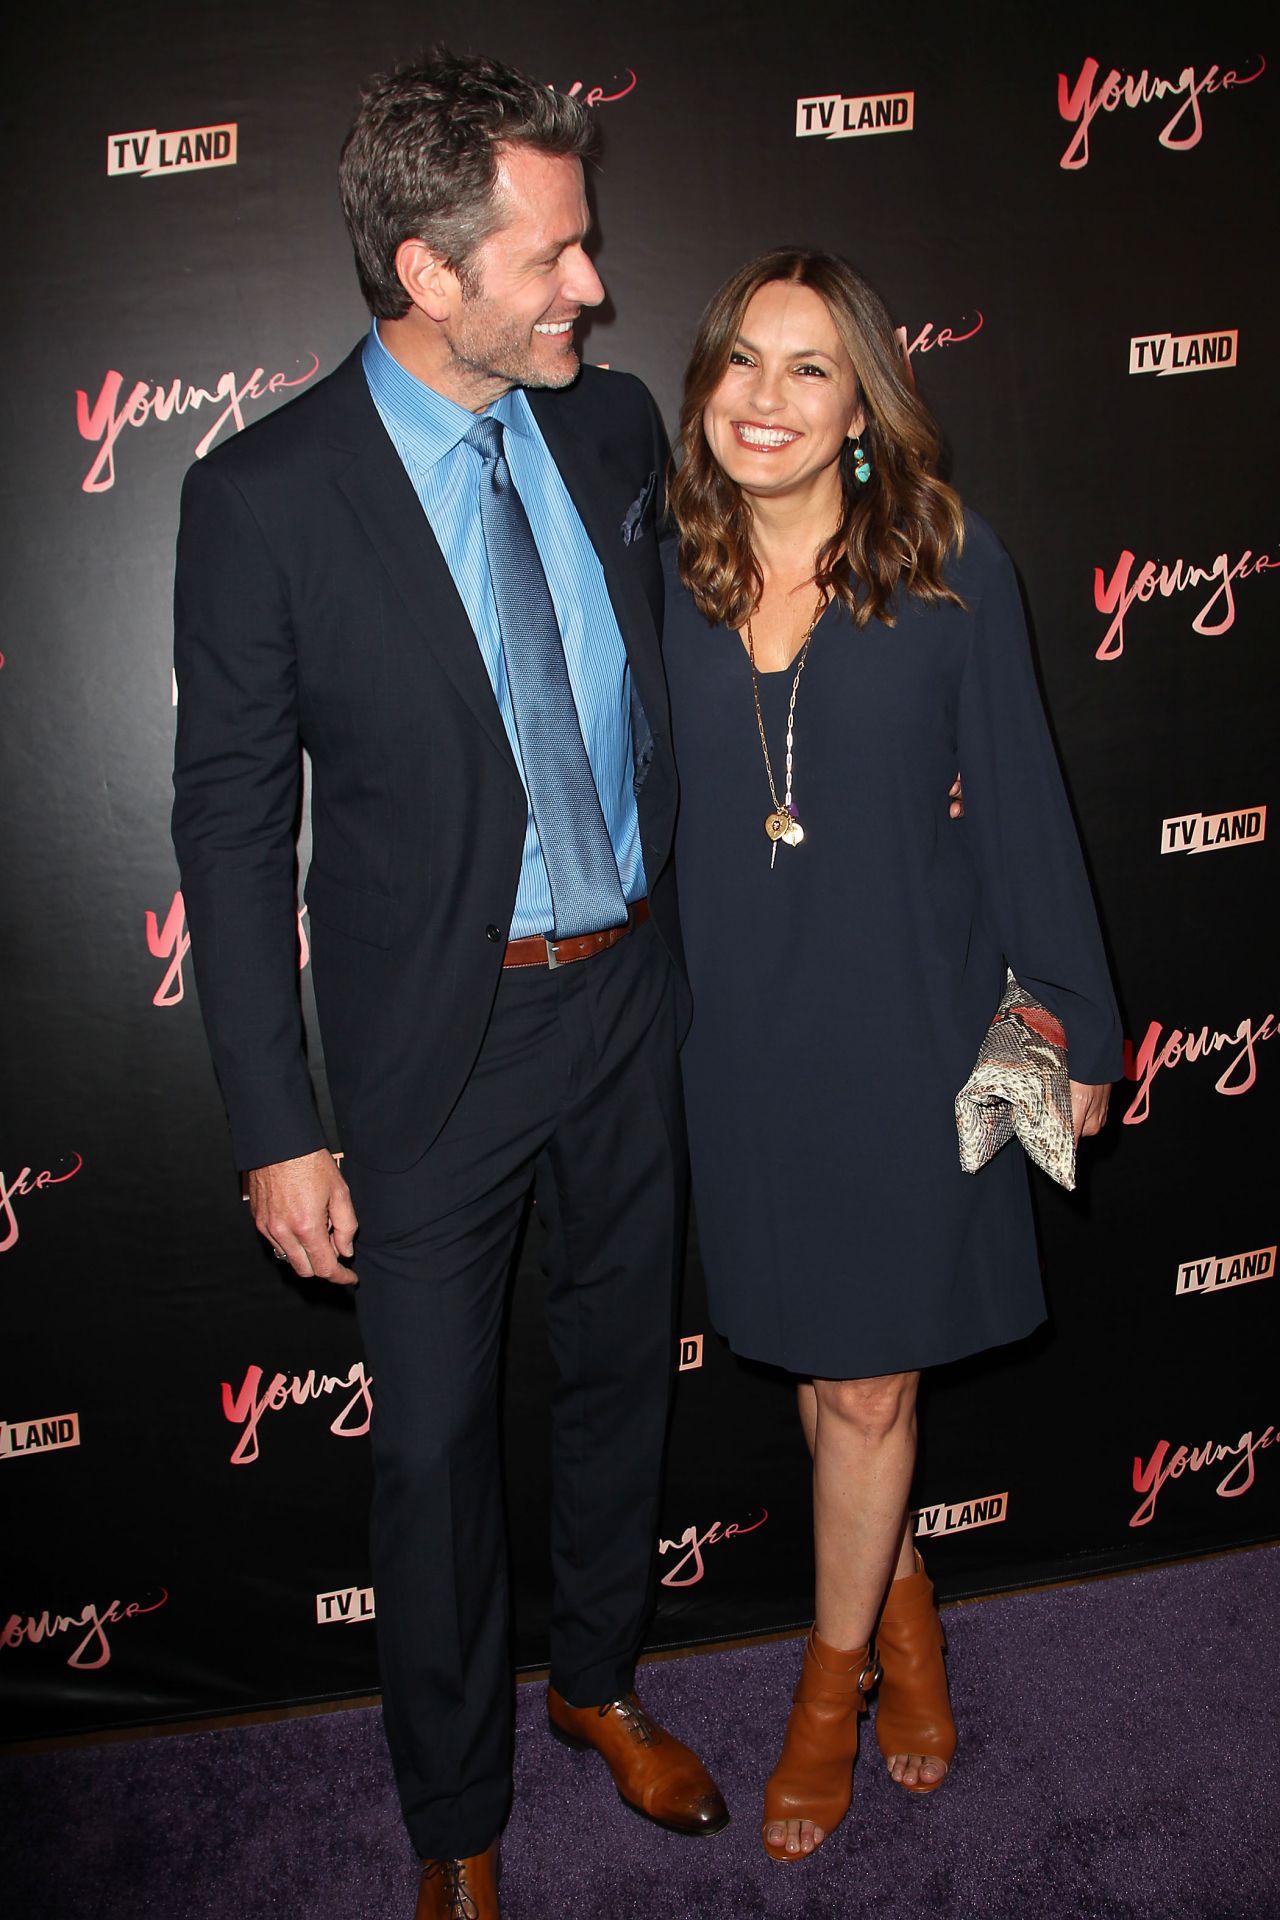 Mariska Hargitay Younger Season 4 Premiere In New York